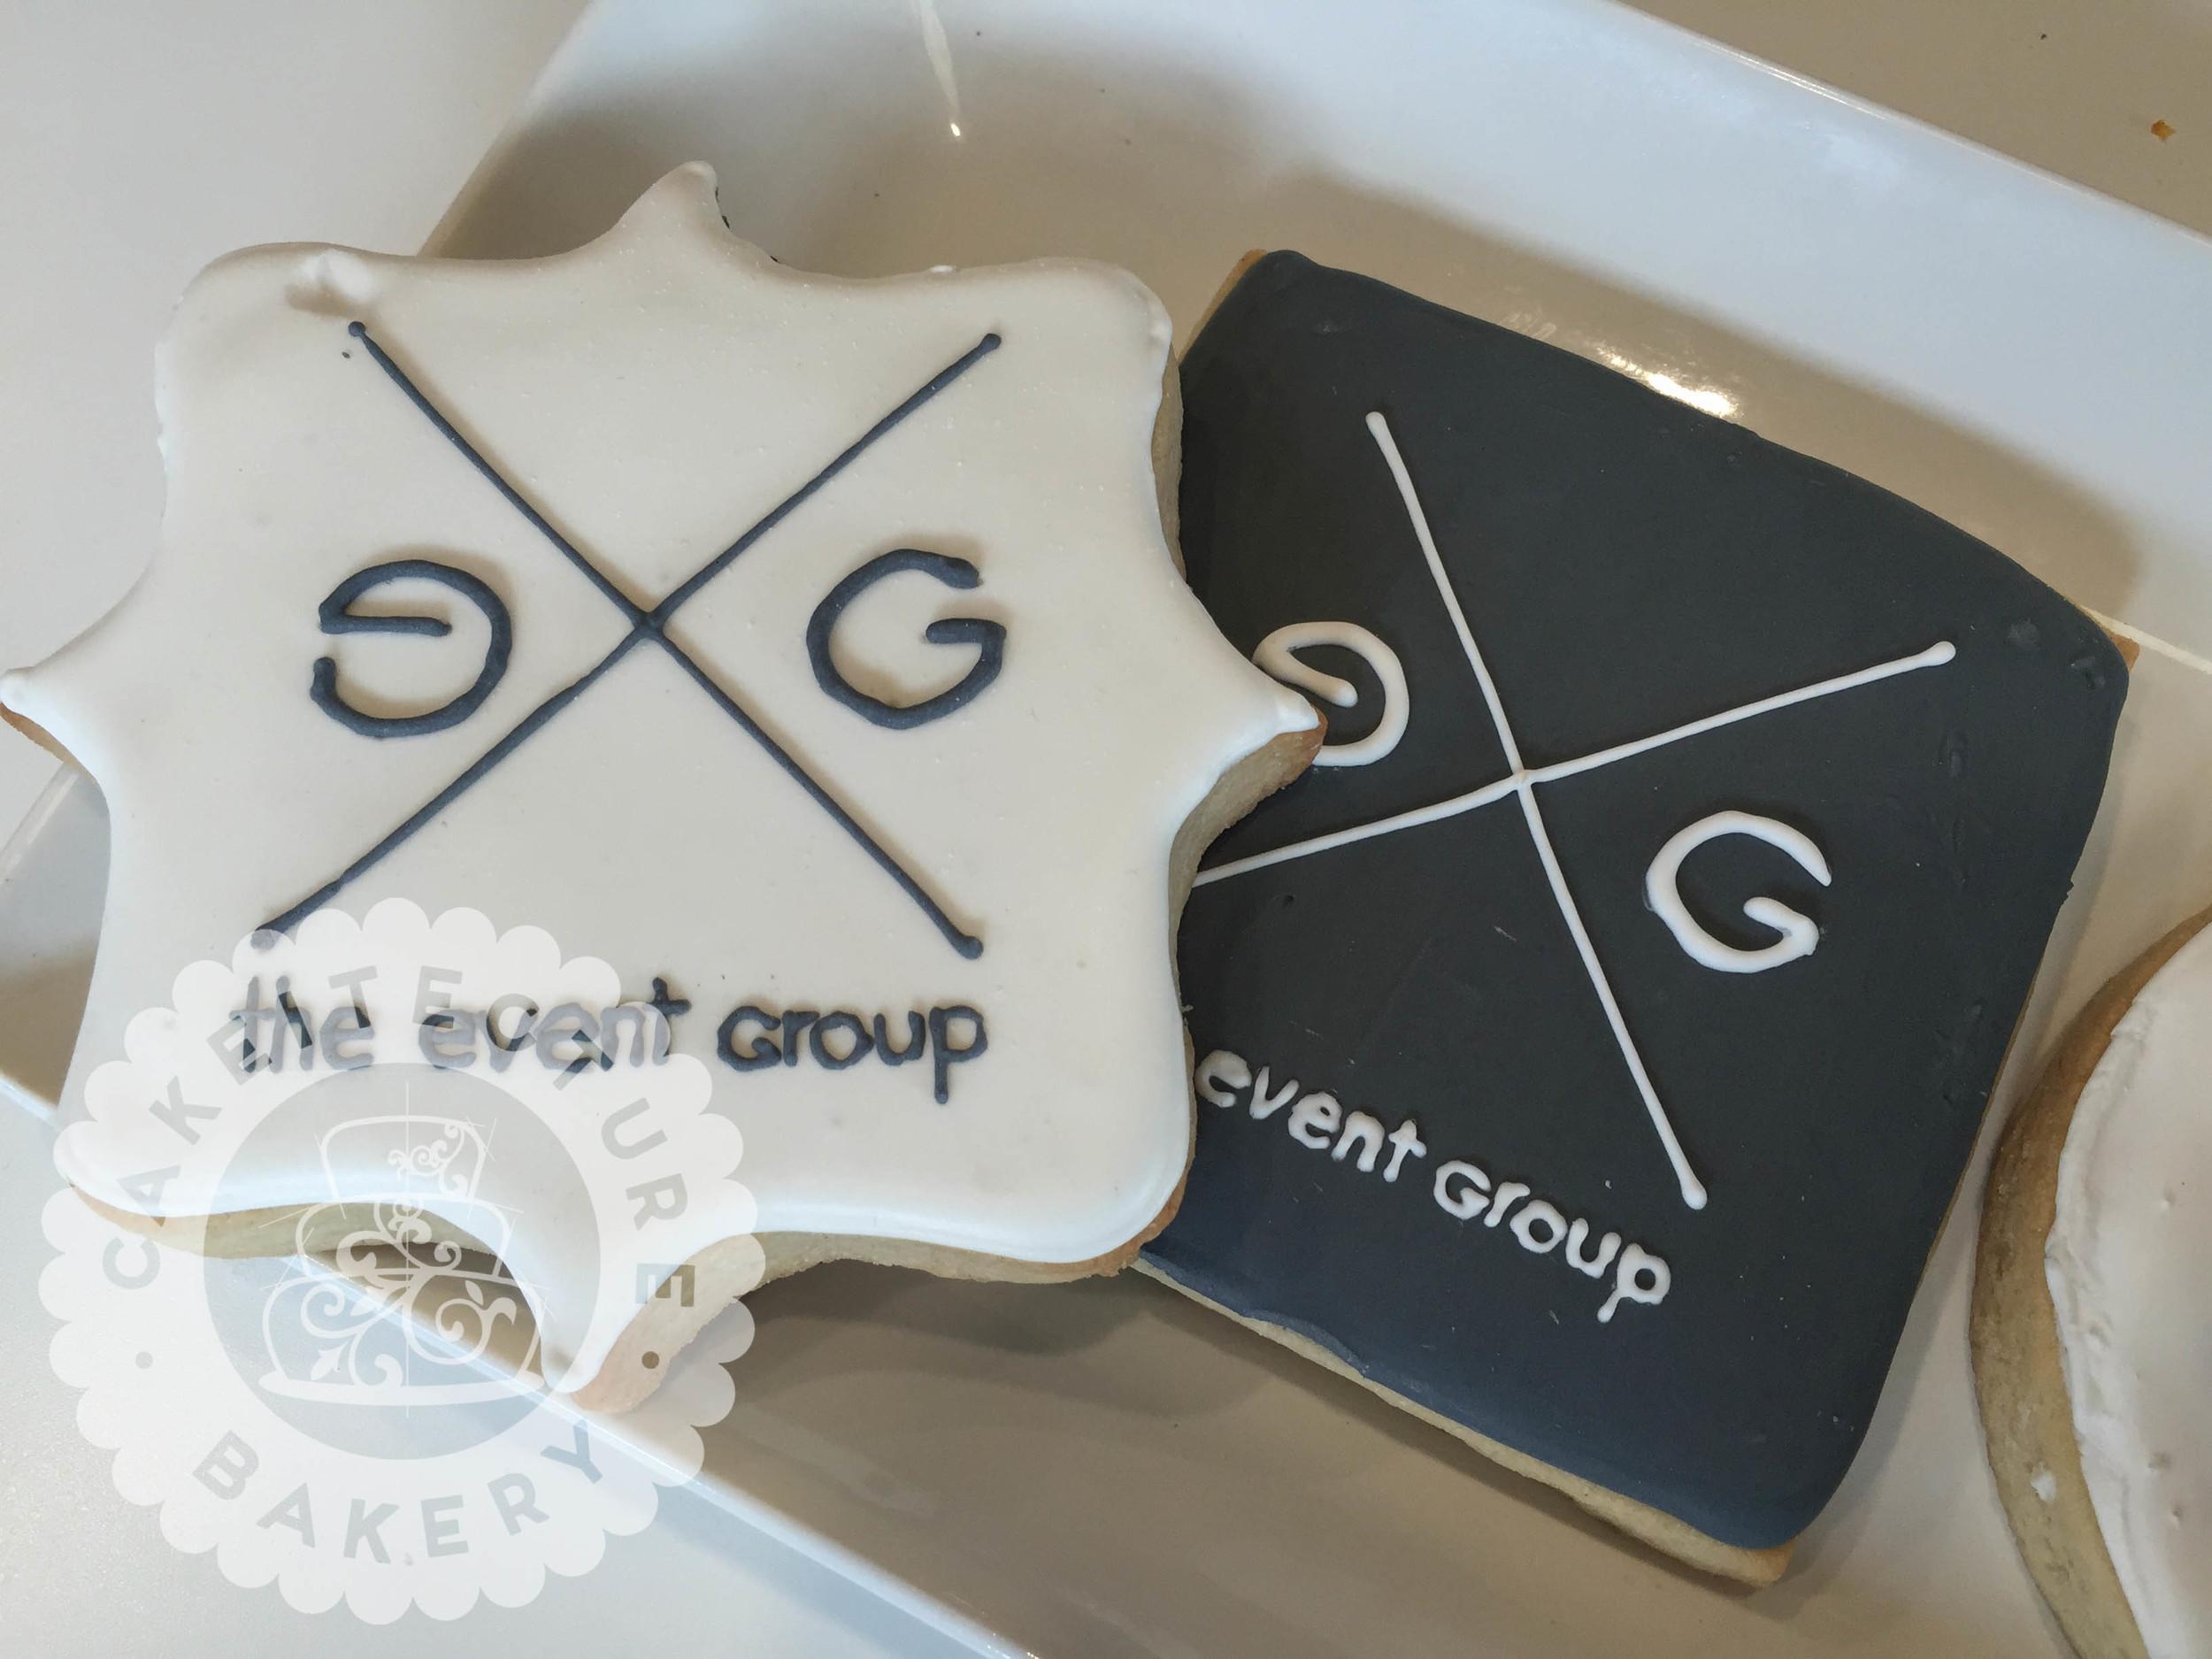 event_group.jpg